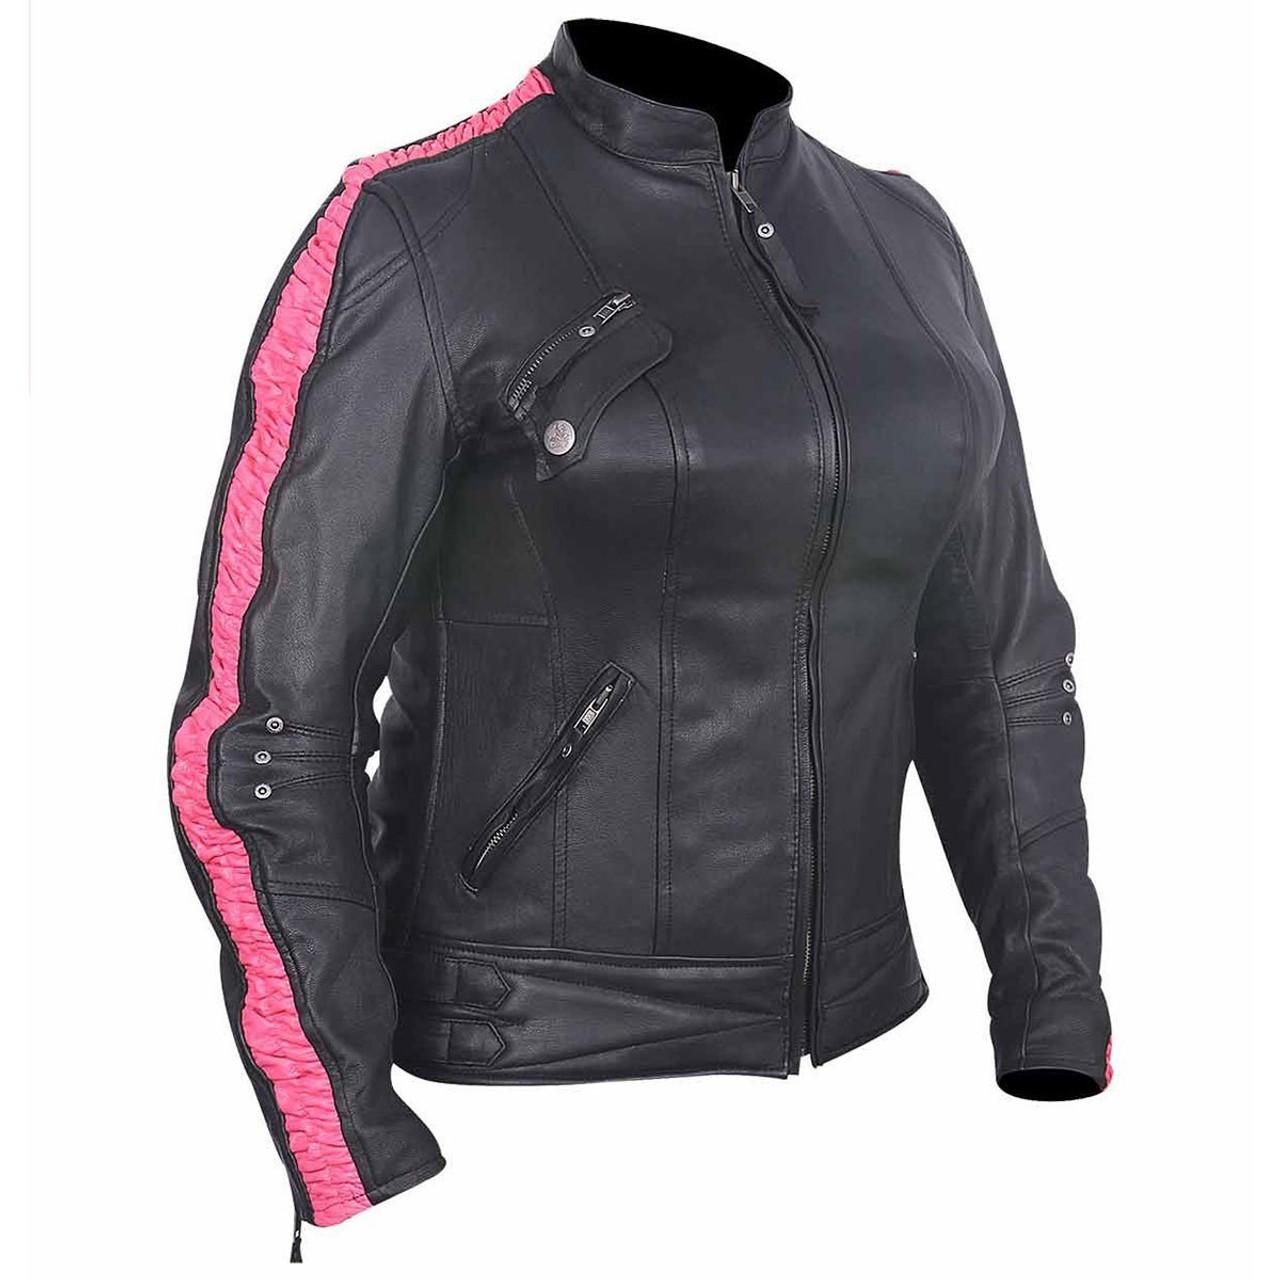 Ladies Women/'s Cowhide Black Leather Biker Motorcycle Jacket Fringe  SIZES XS-5X